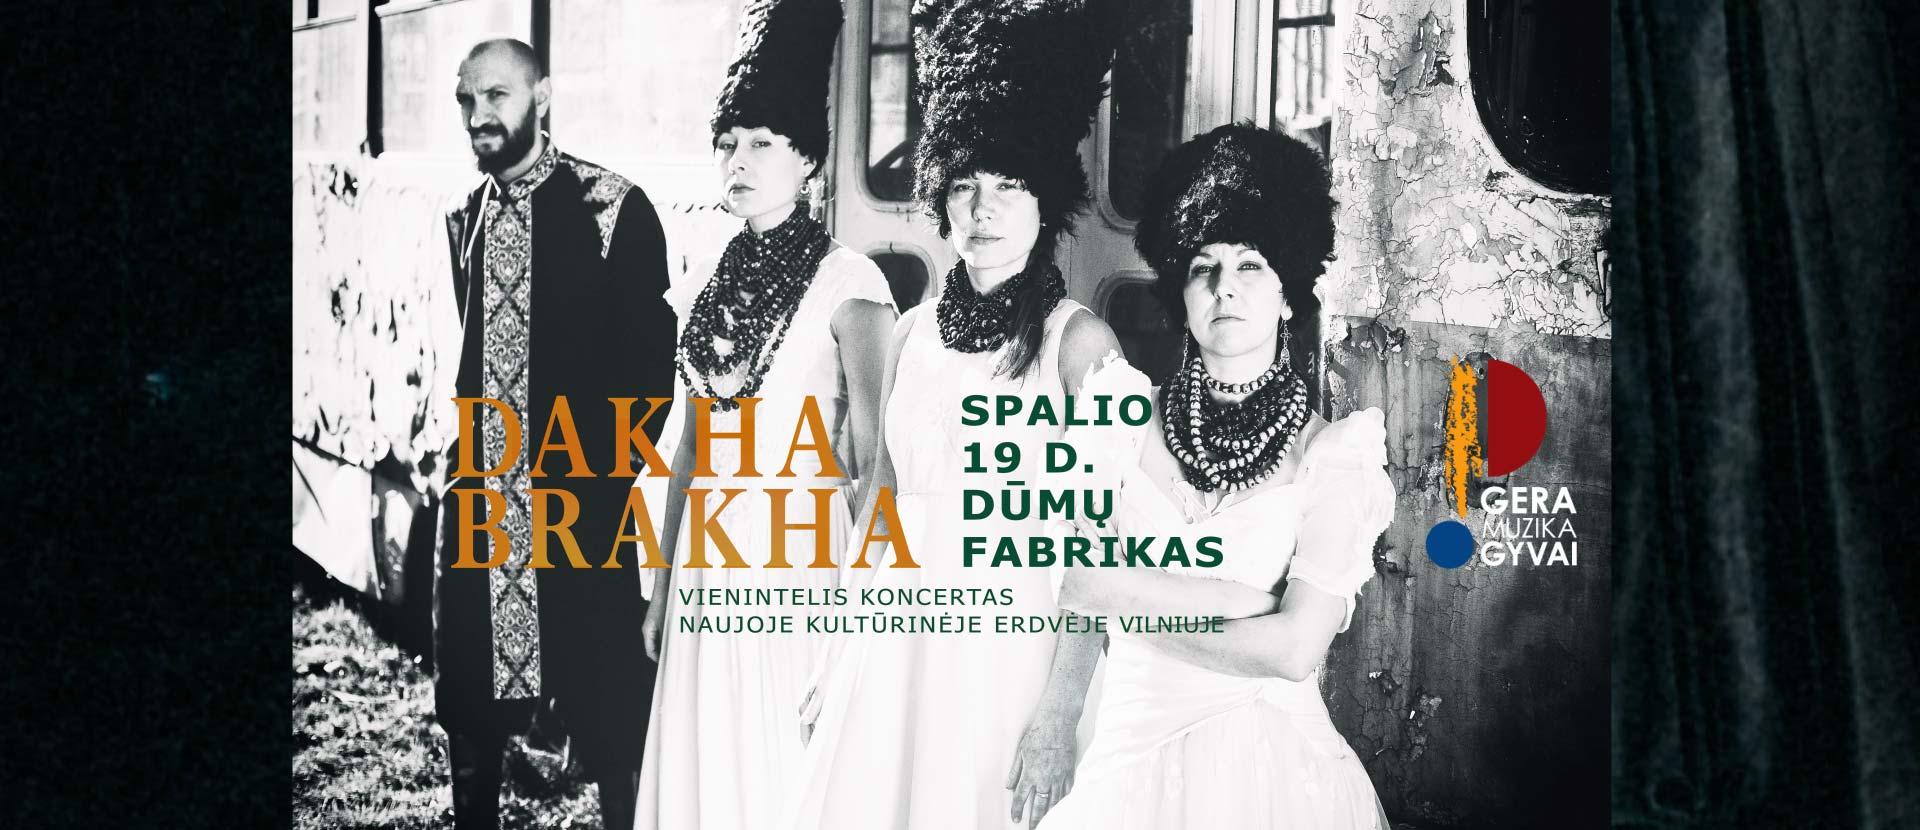 """DAKHABRAKHA"" CONCERT (Ukraine)"